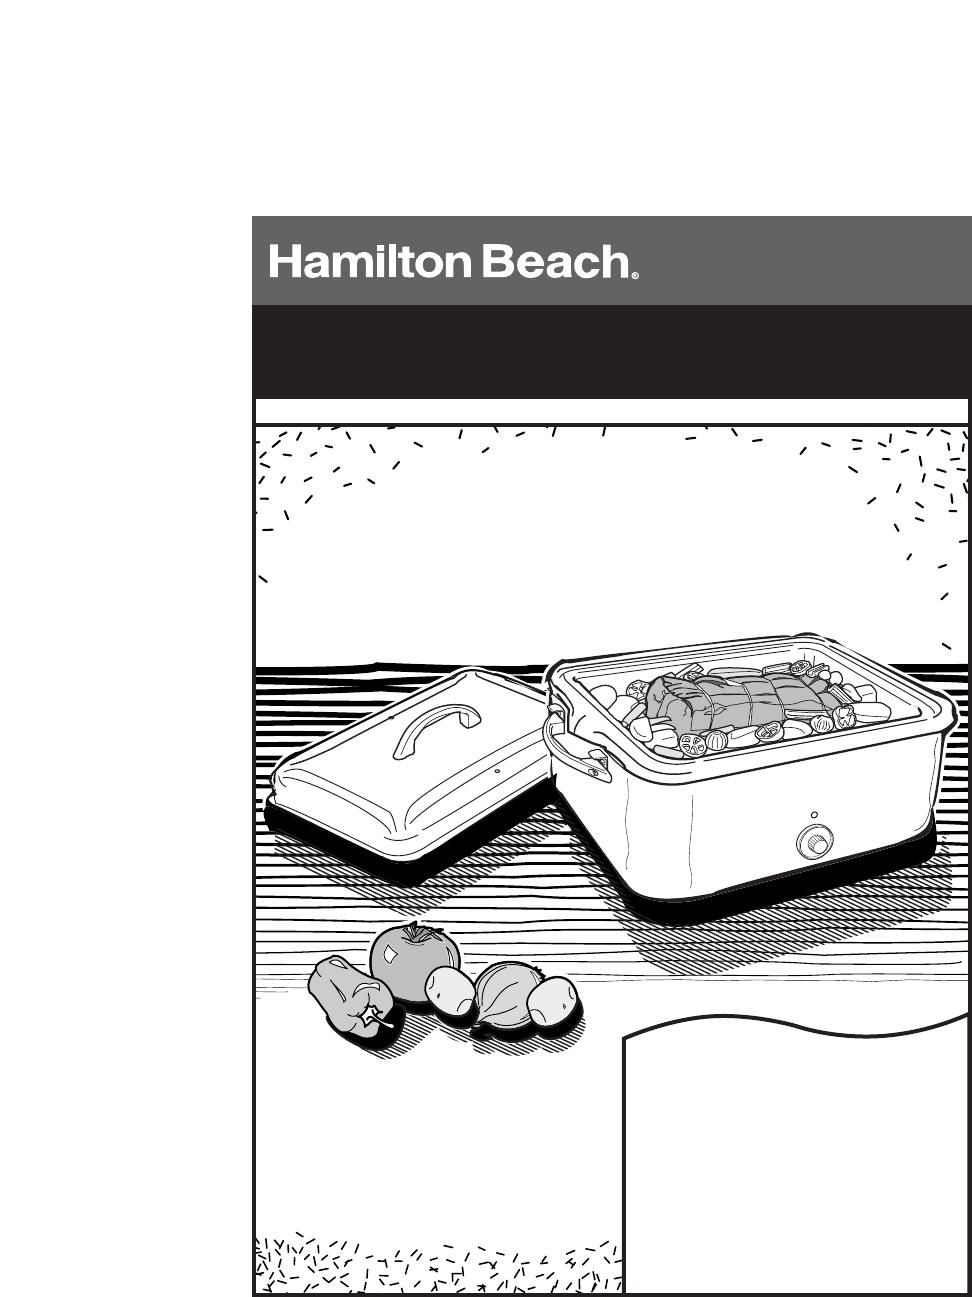 Hamilton Beach Owner S Manual 18 Quart Roaster Oven Manualsonline